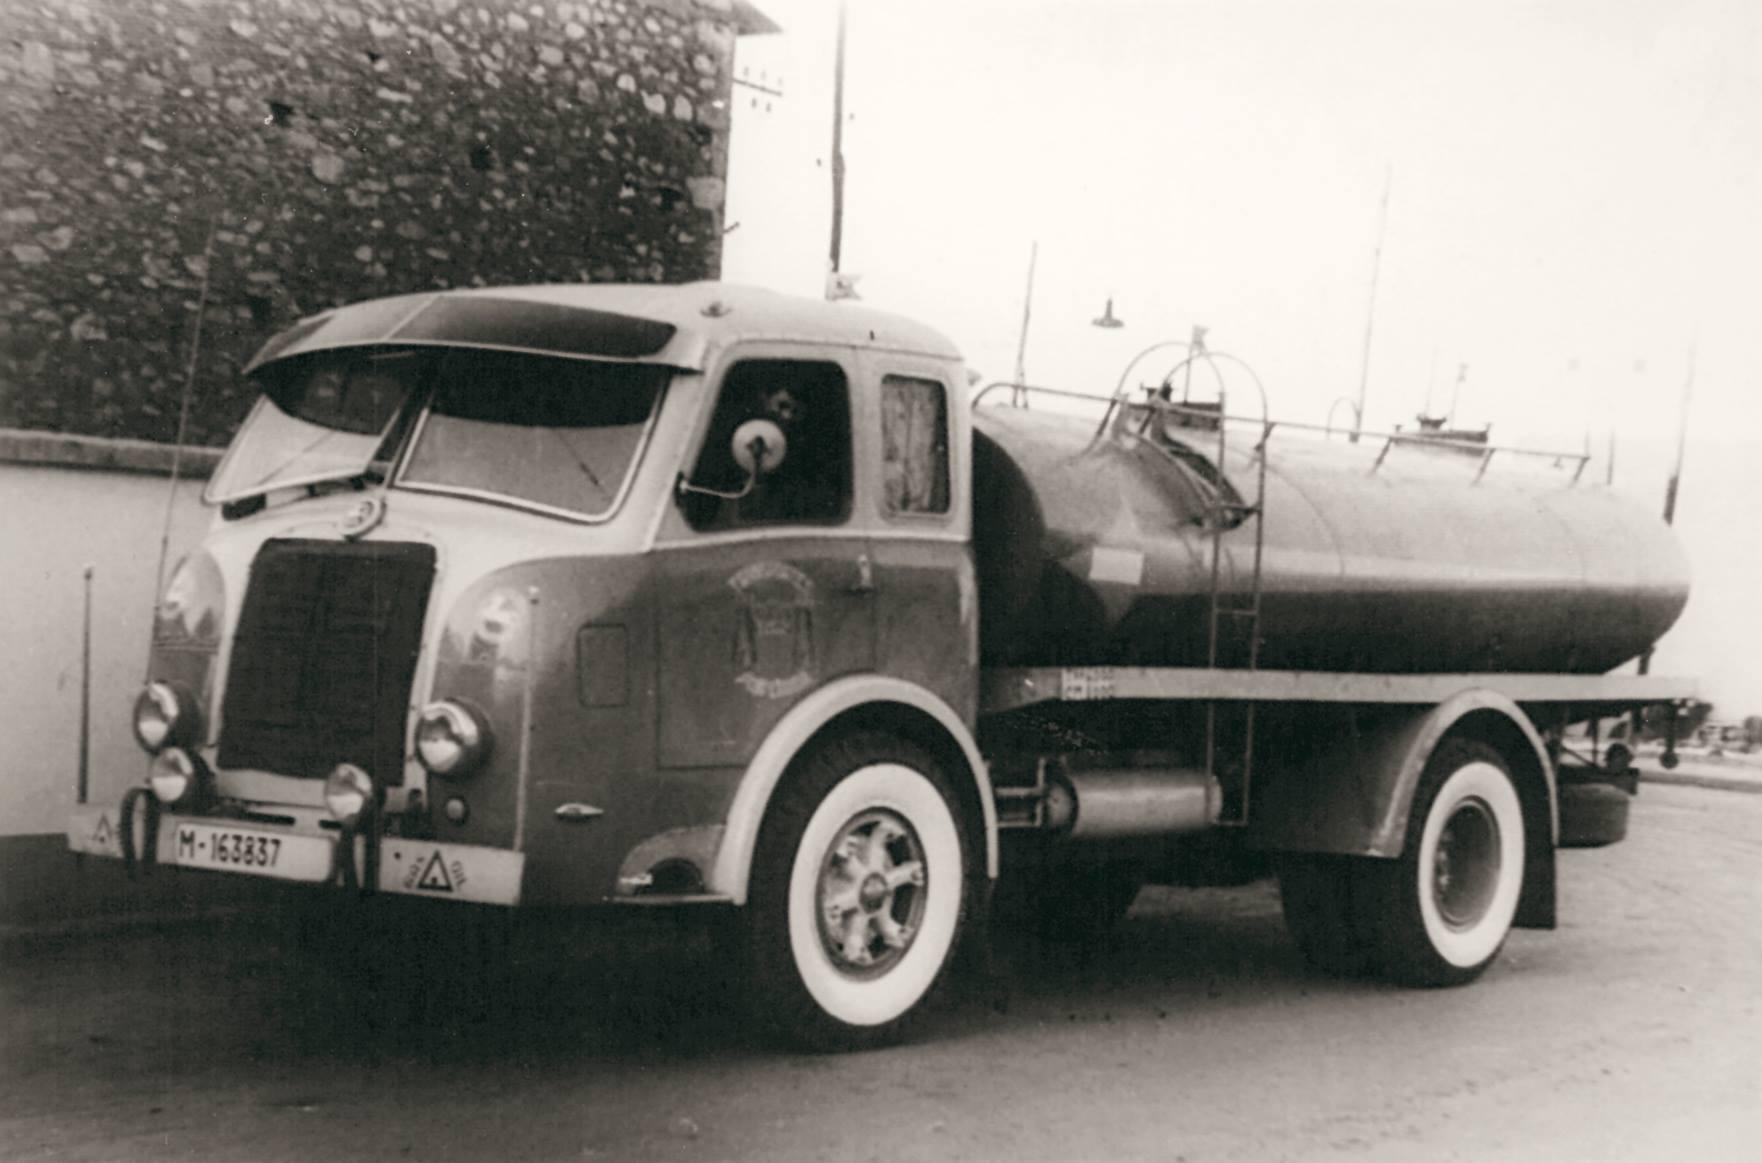 Pegaso-met-wangen-140CV-jaren-50-transport-Antonio-Vidal-Ramos